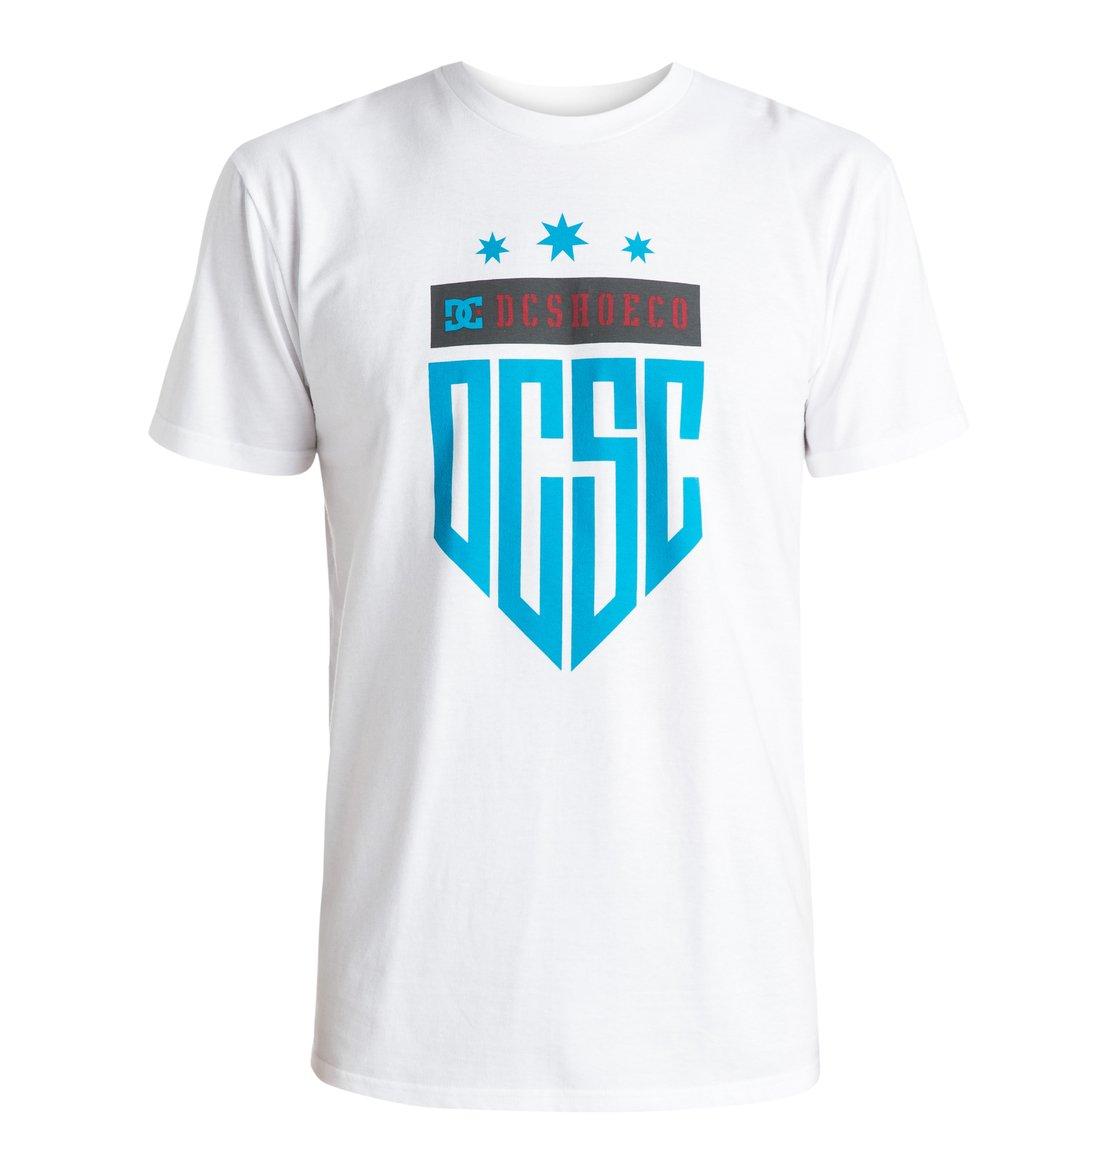 Champeon T-Shirt